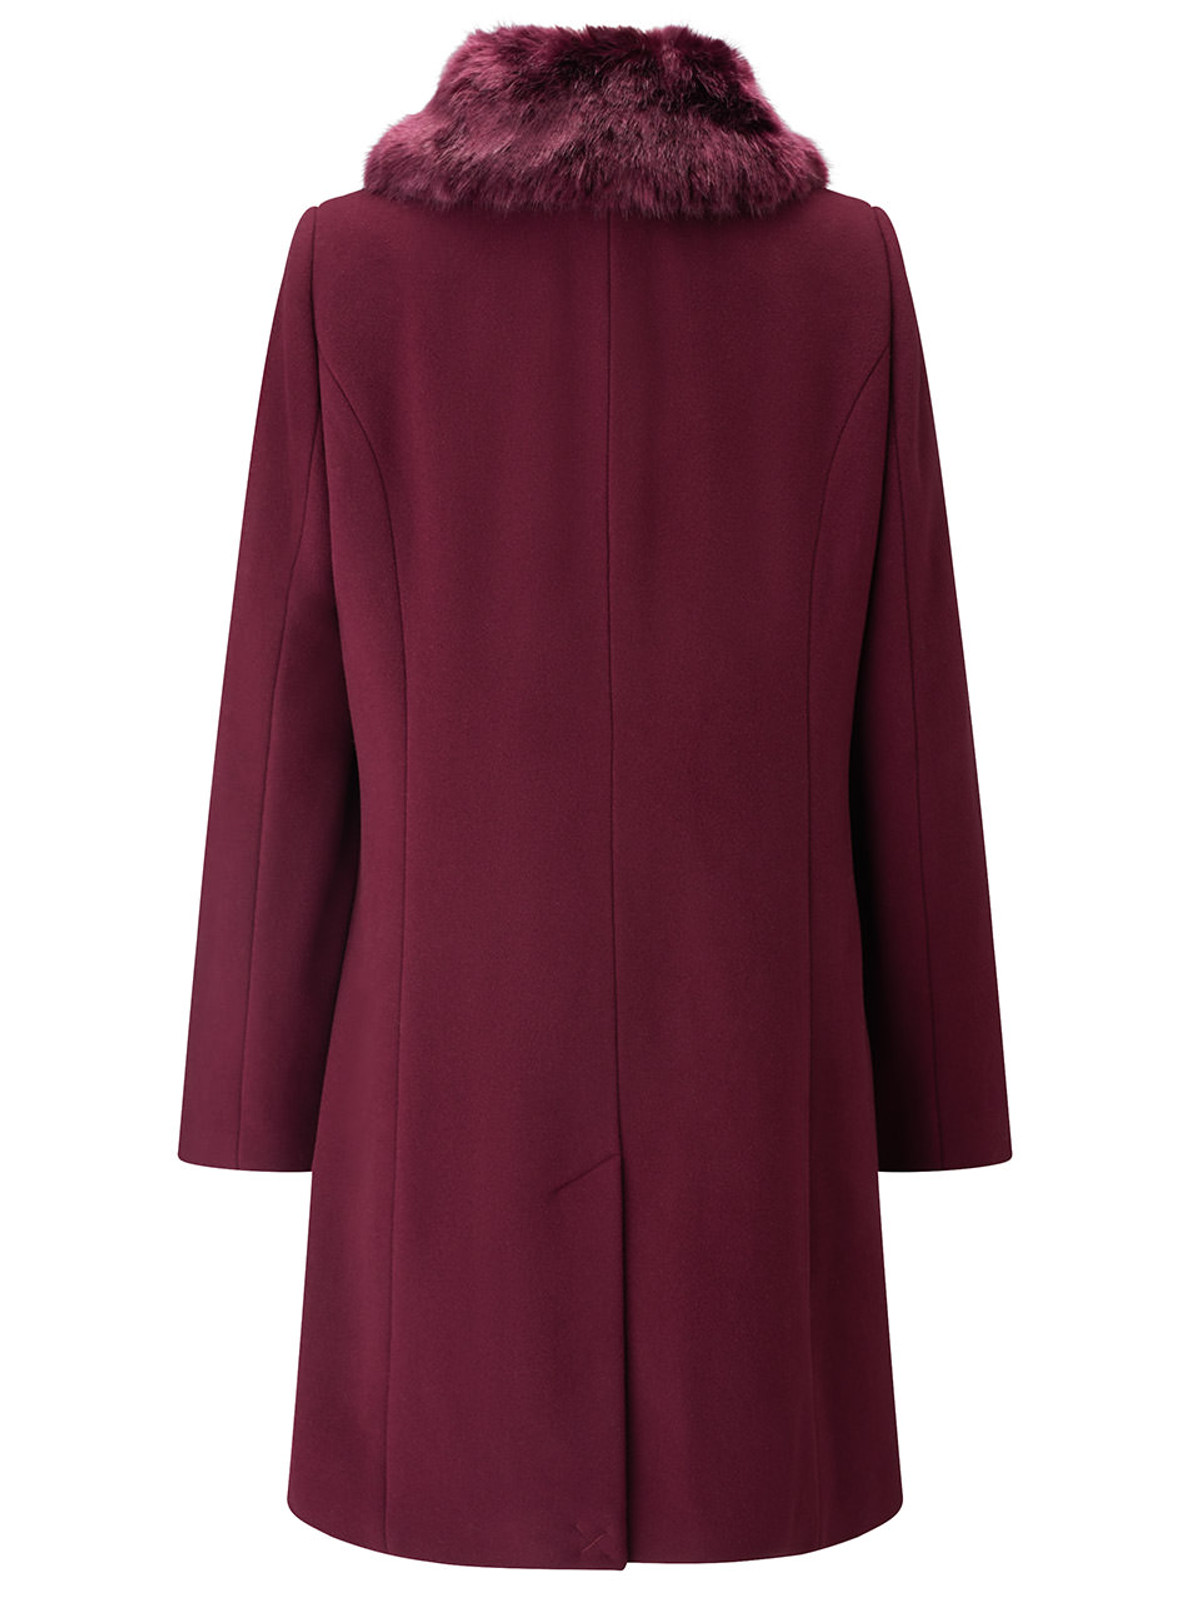 Fur Collar Coat, Berry